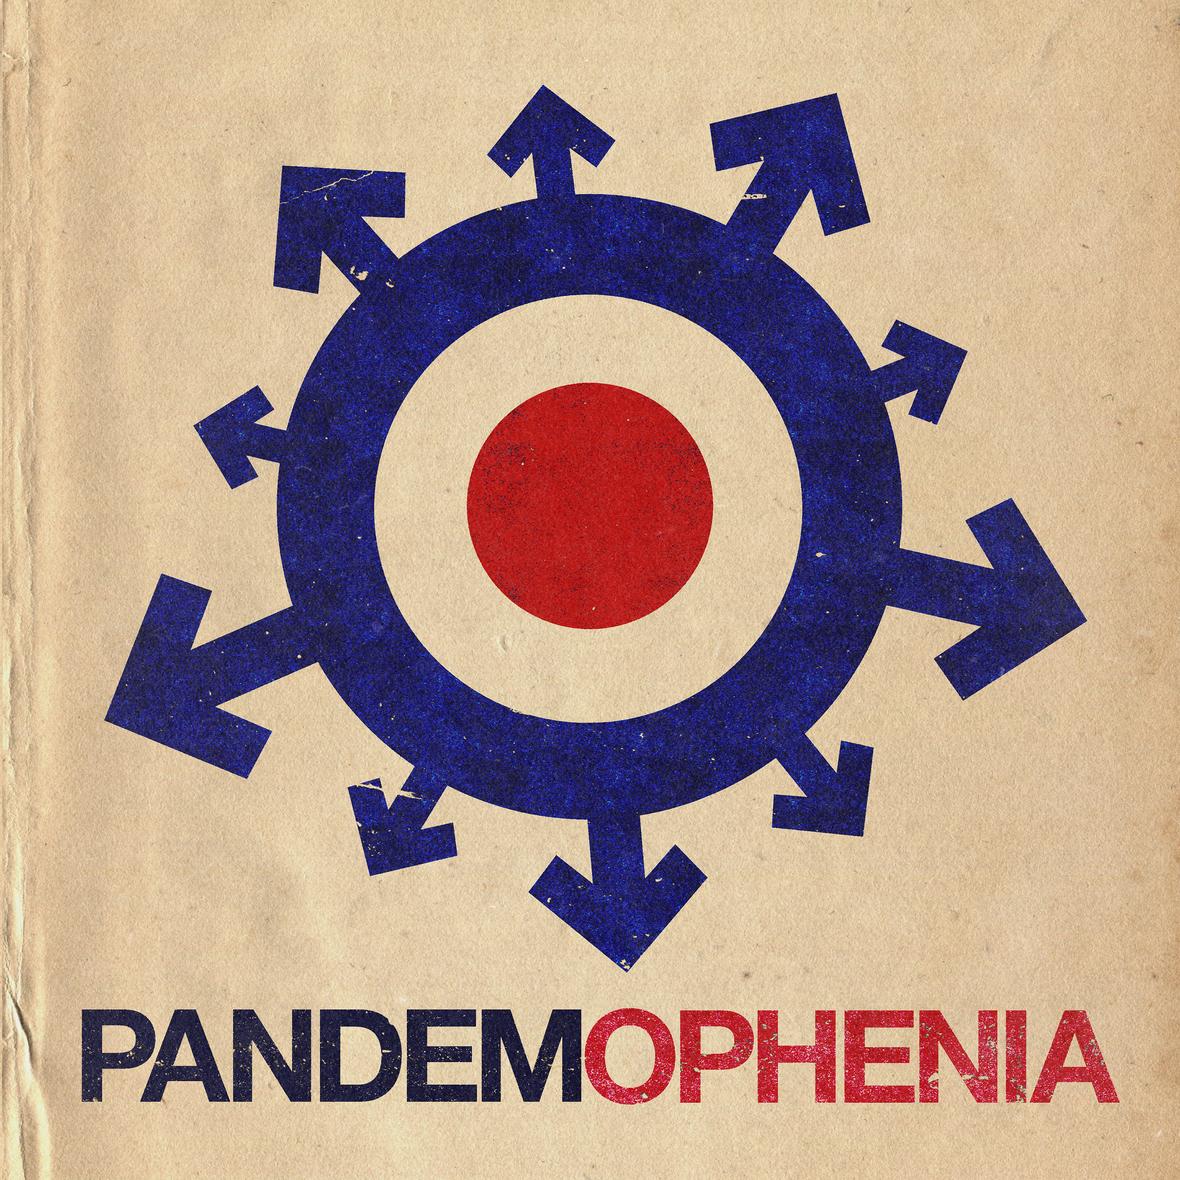 pandemophenia 3000x3000